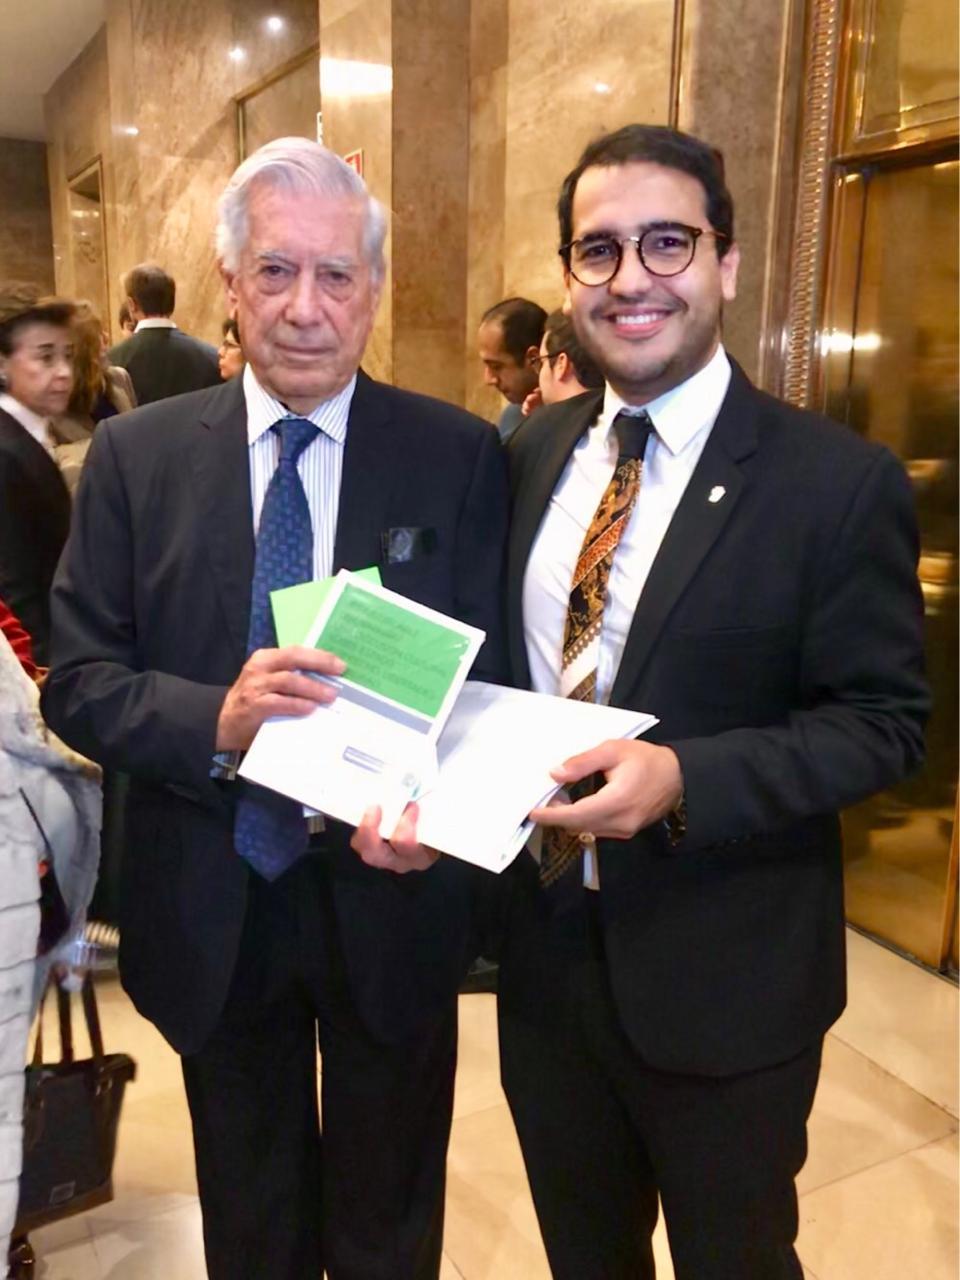 Mario-Vargas Llosa-Herman-Duarte